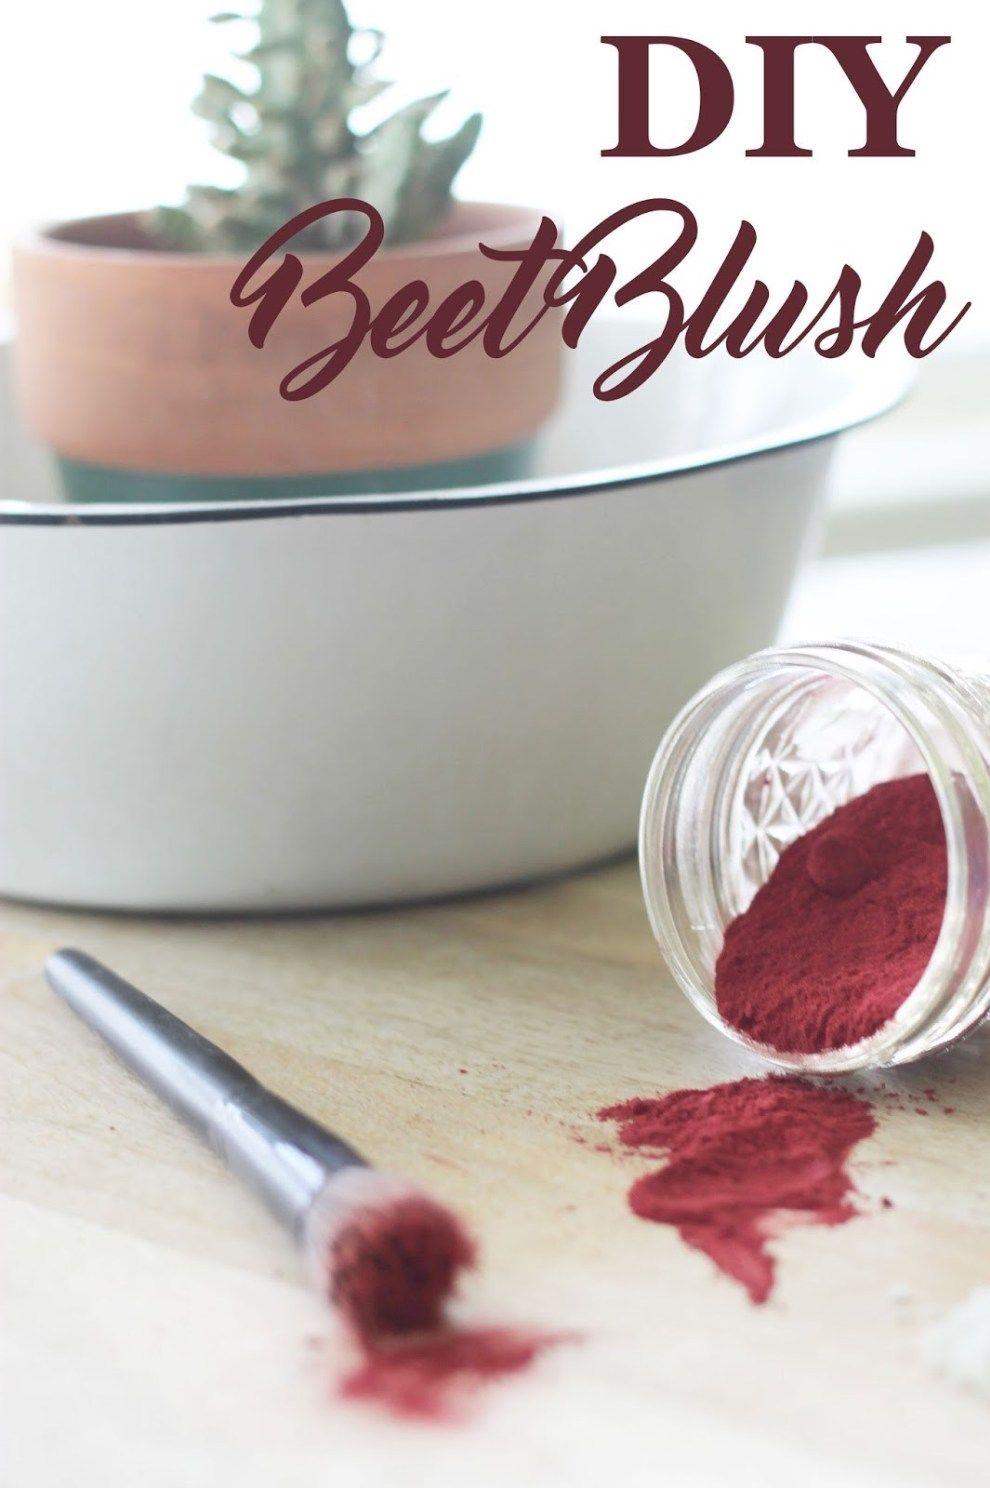 DIY Beet Blush Zero waste, Organic living, Diy beauty